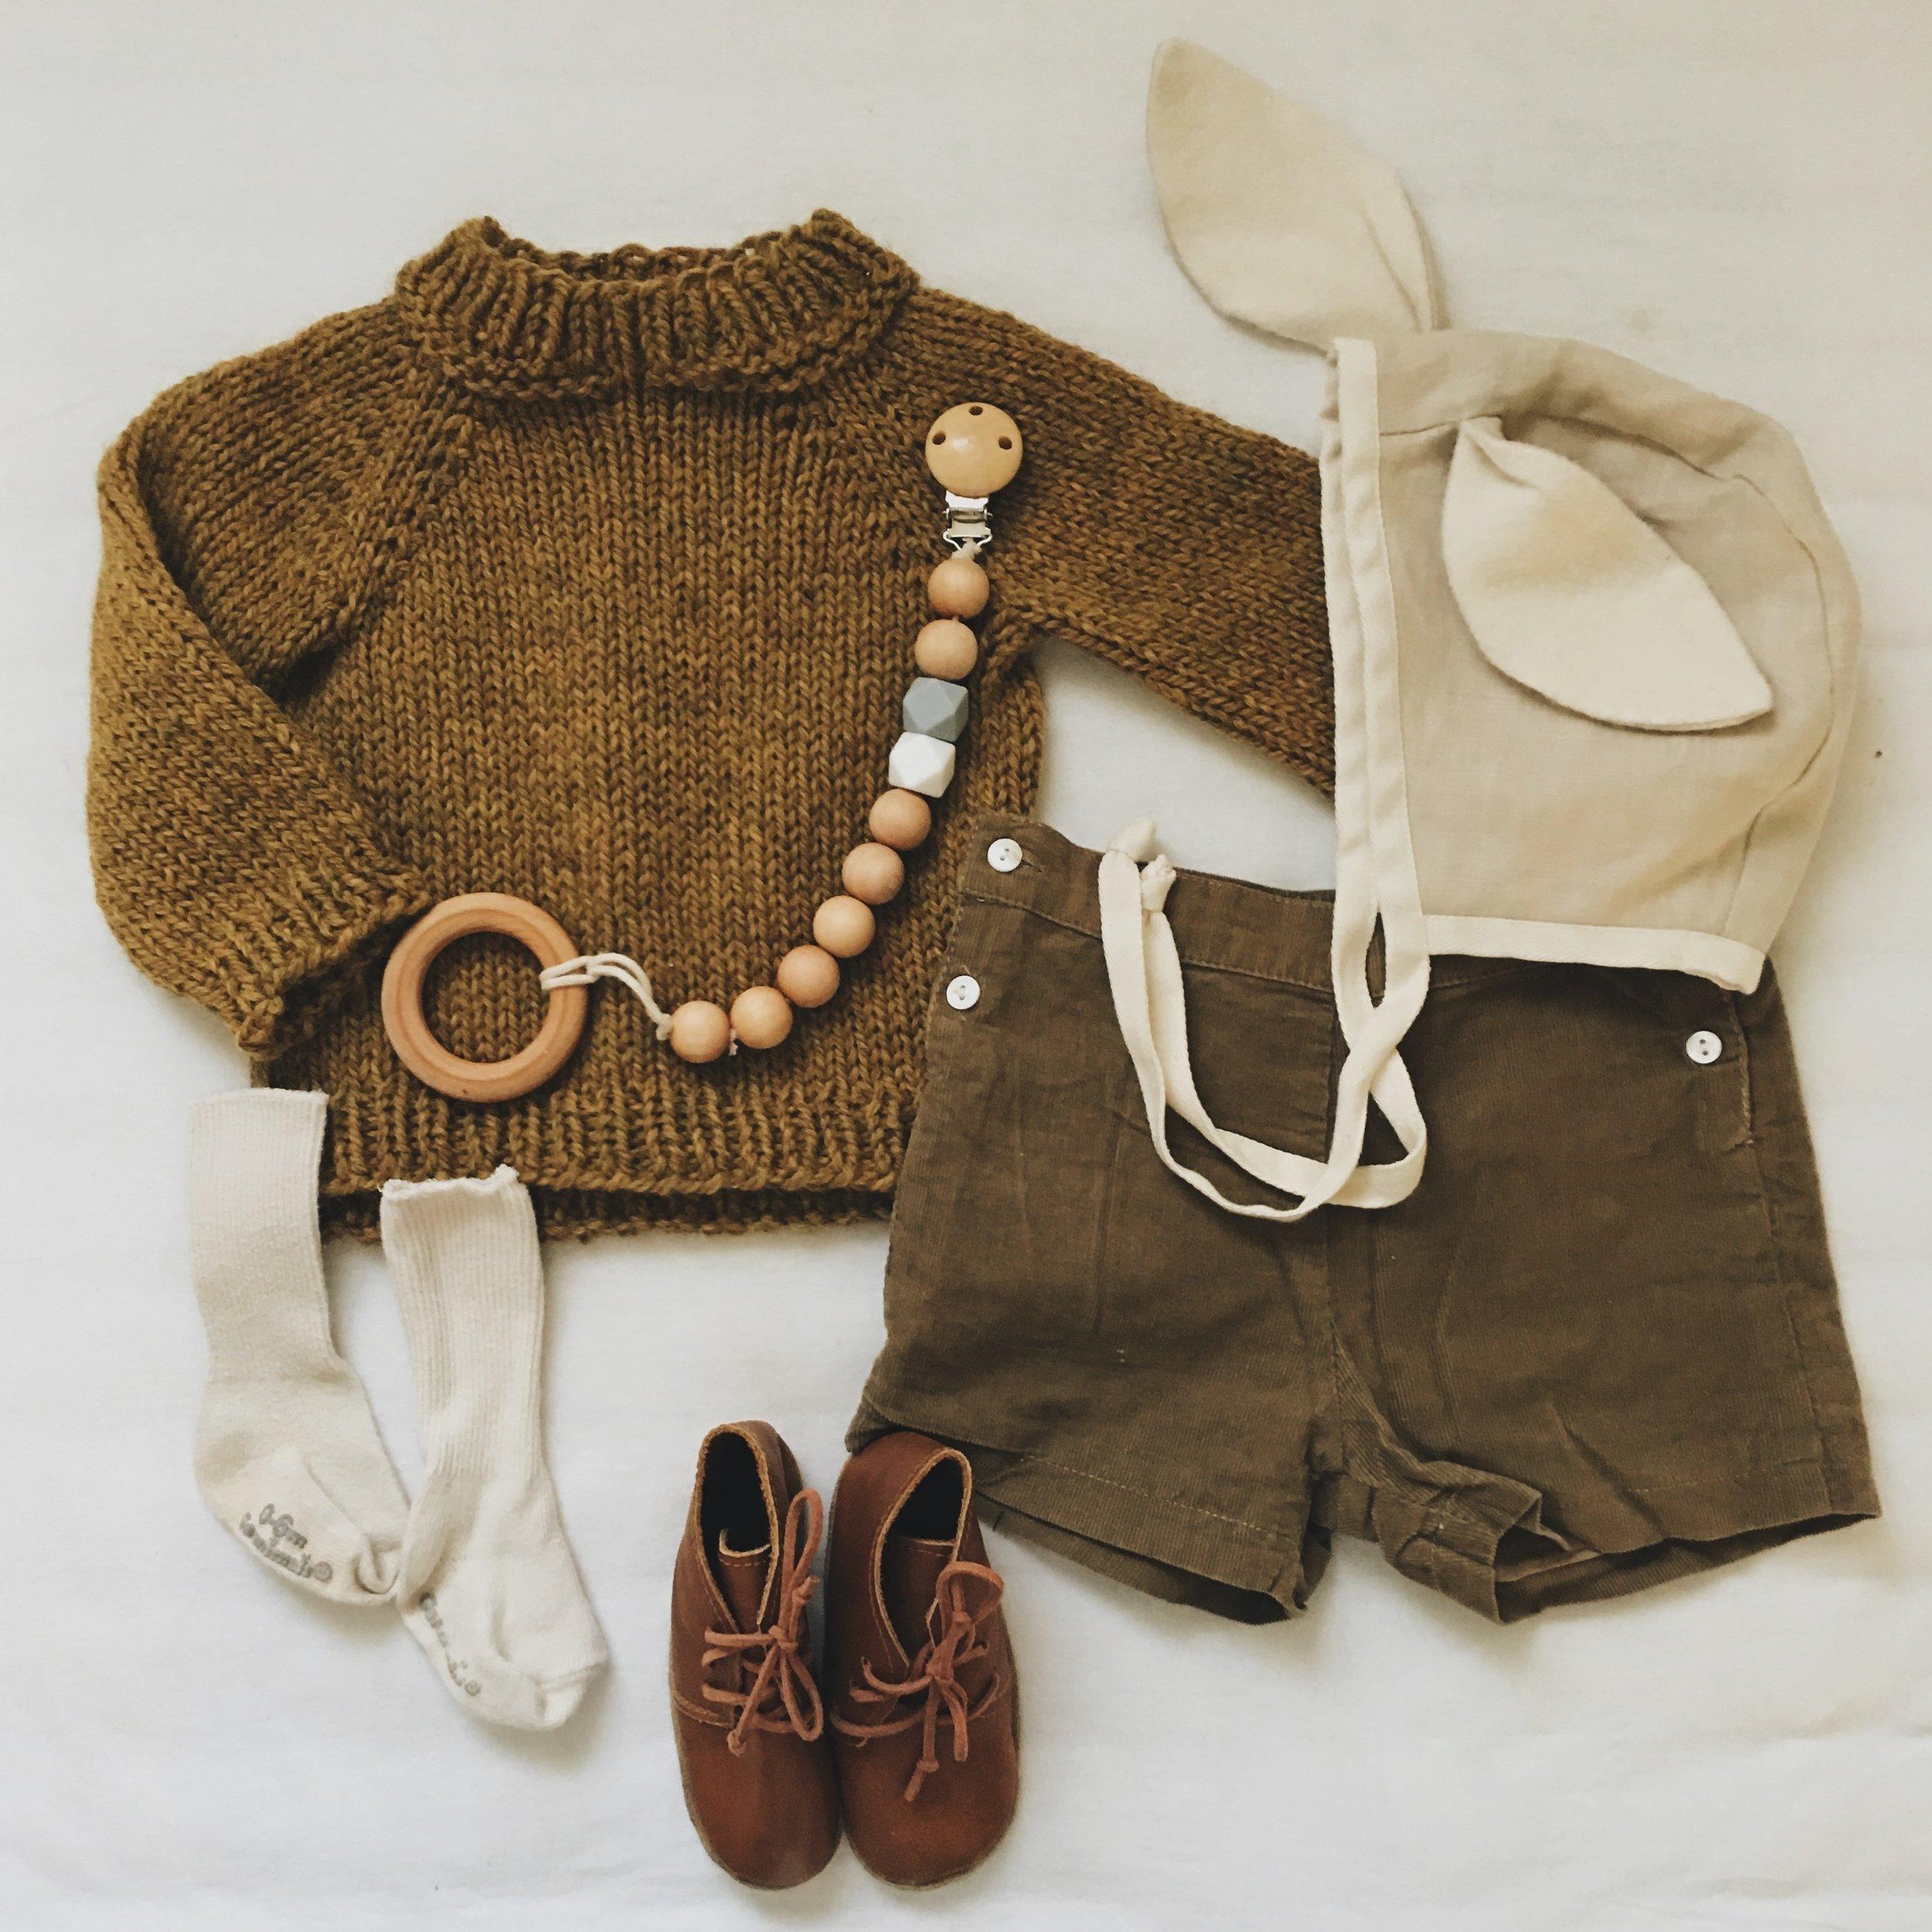 Fisherman's Sweater c/o  A Little Sweater Shop  ; Shorts c/o  Bubala Kids  ;  Linen Rabbit-eared Bonnet  c/o  Tortoise and The Hare Clothing  ;  Leather Booties  c/o  Ulla + Viggo ;  Pacifier Clip  c/o  Wild Creek Co